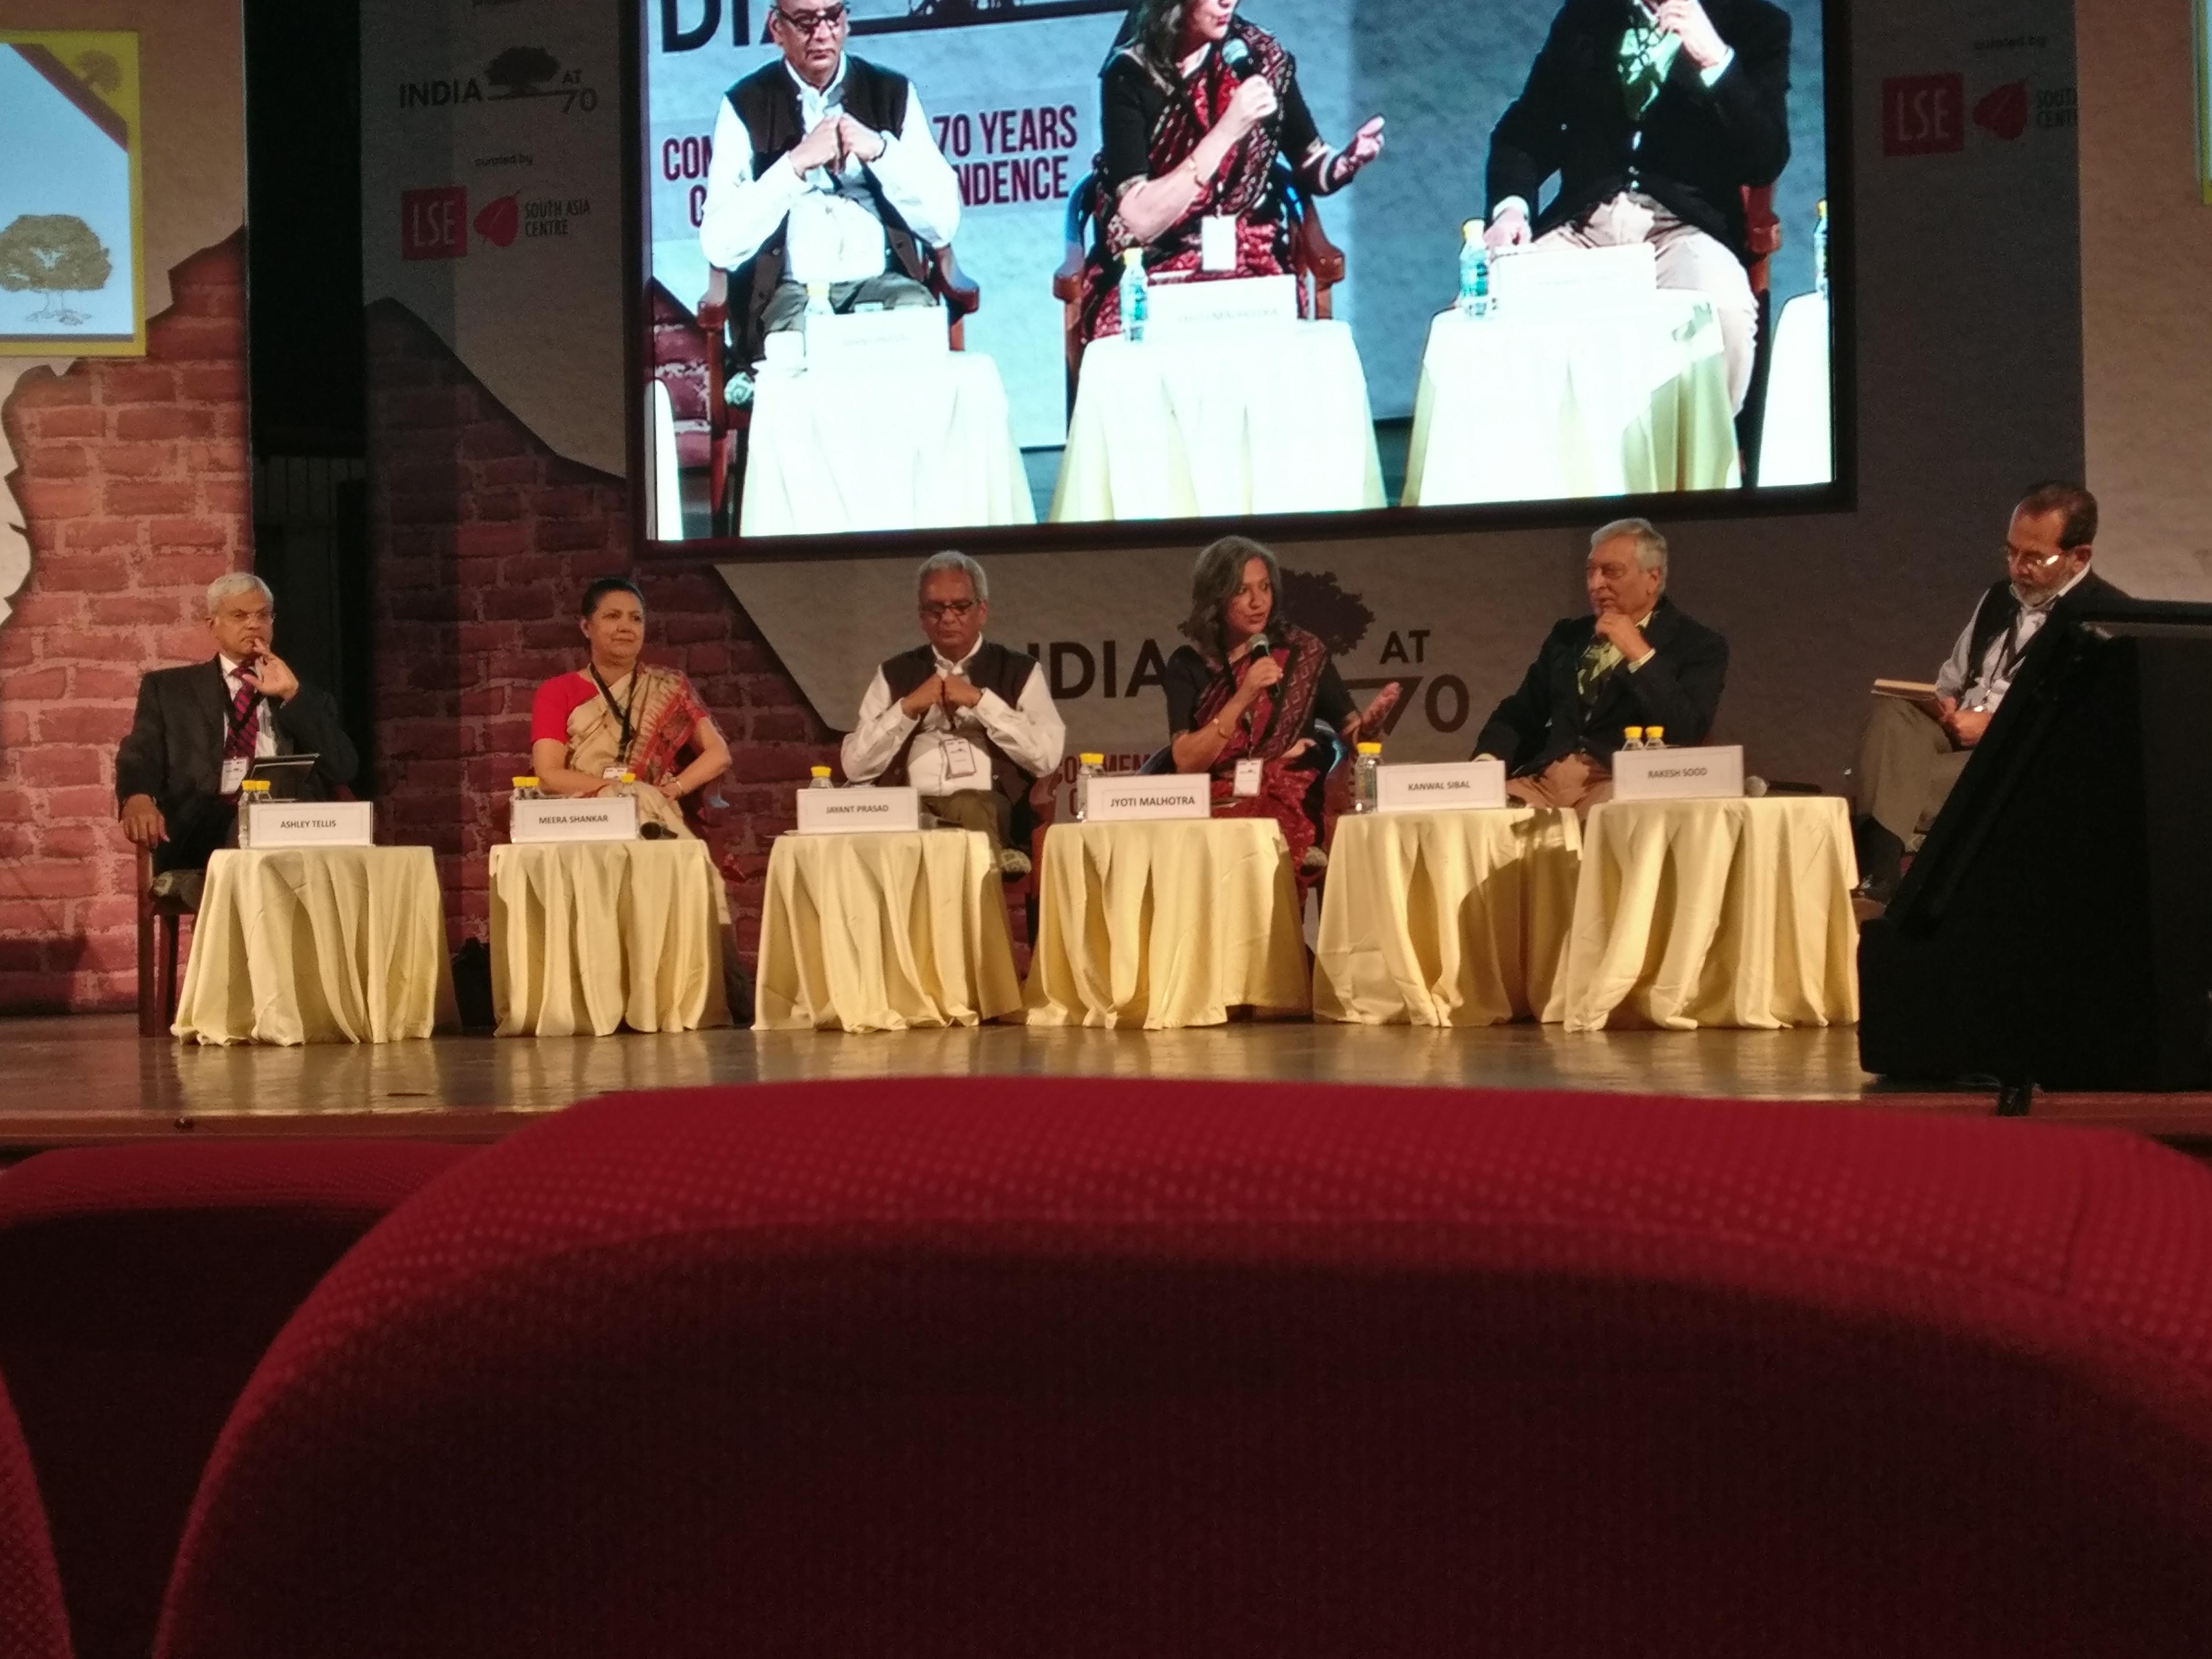 From left: Ashley J Tellis, Meera Shankar, Jayant Prasad, Jyoti Malhotra (moderator), Kanwal Sibal and Rakesh Sood.